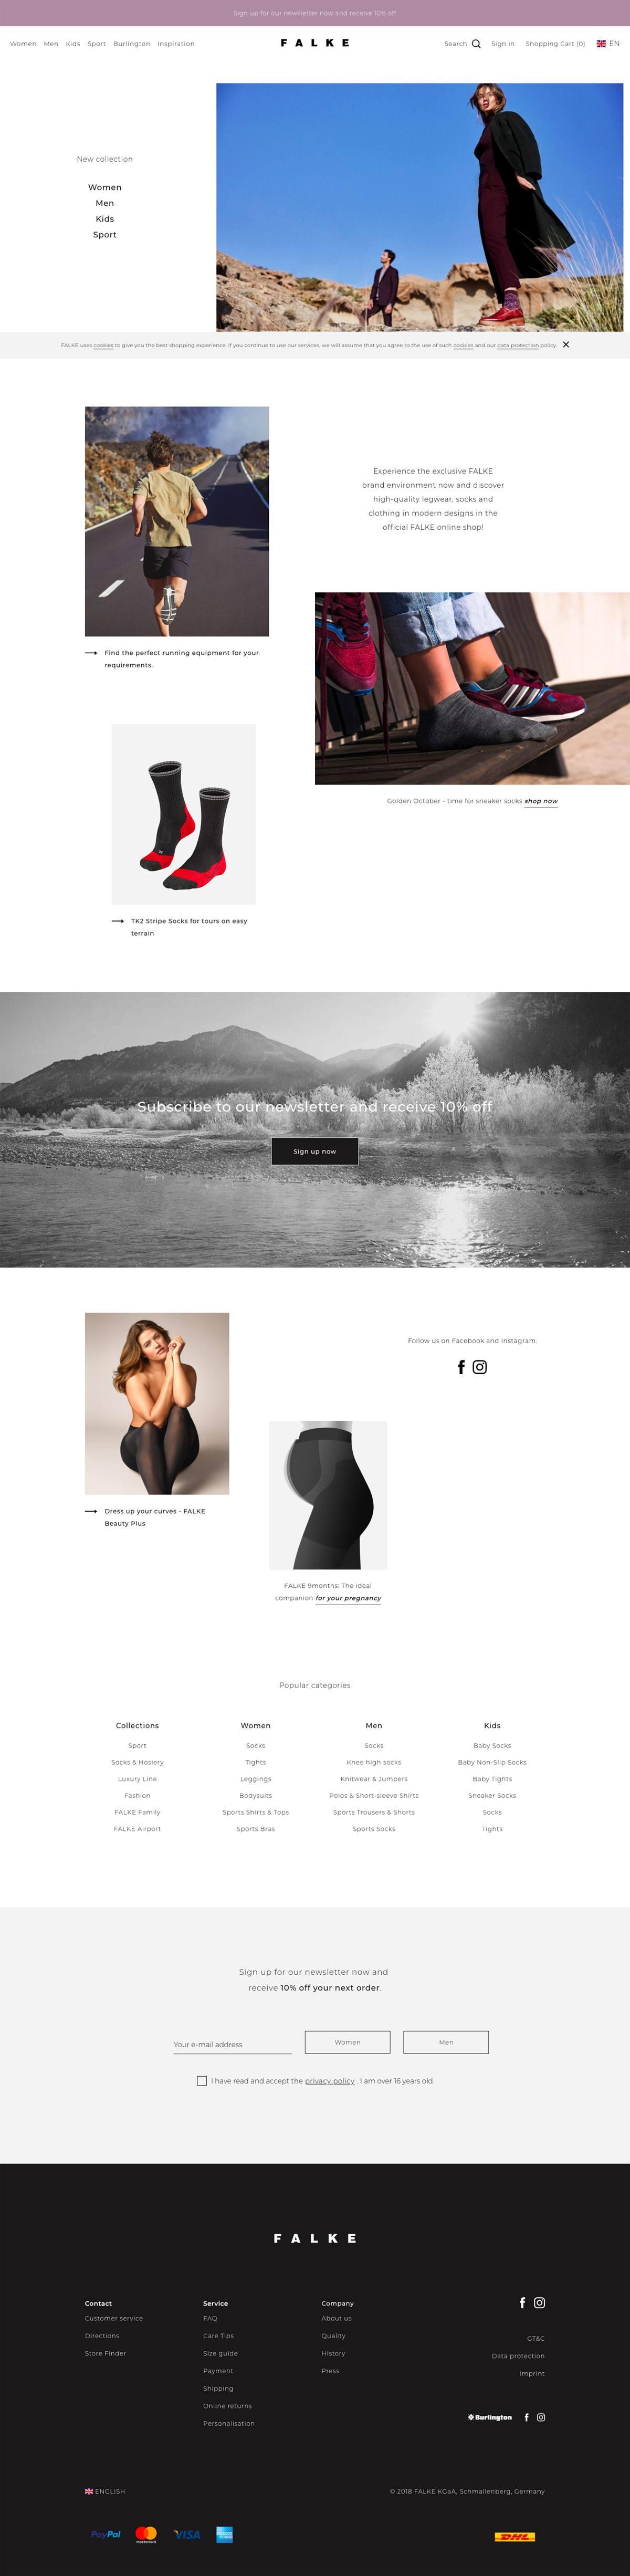 eCommerce website: Falke